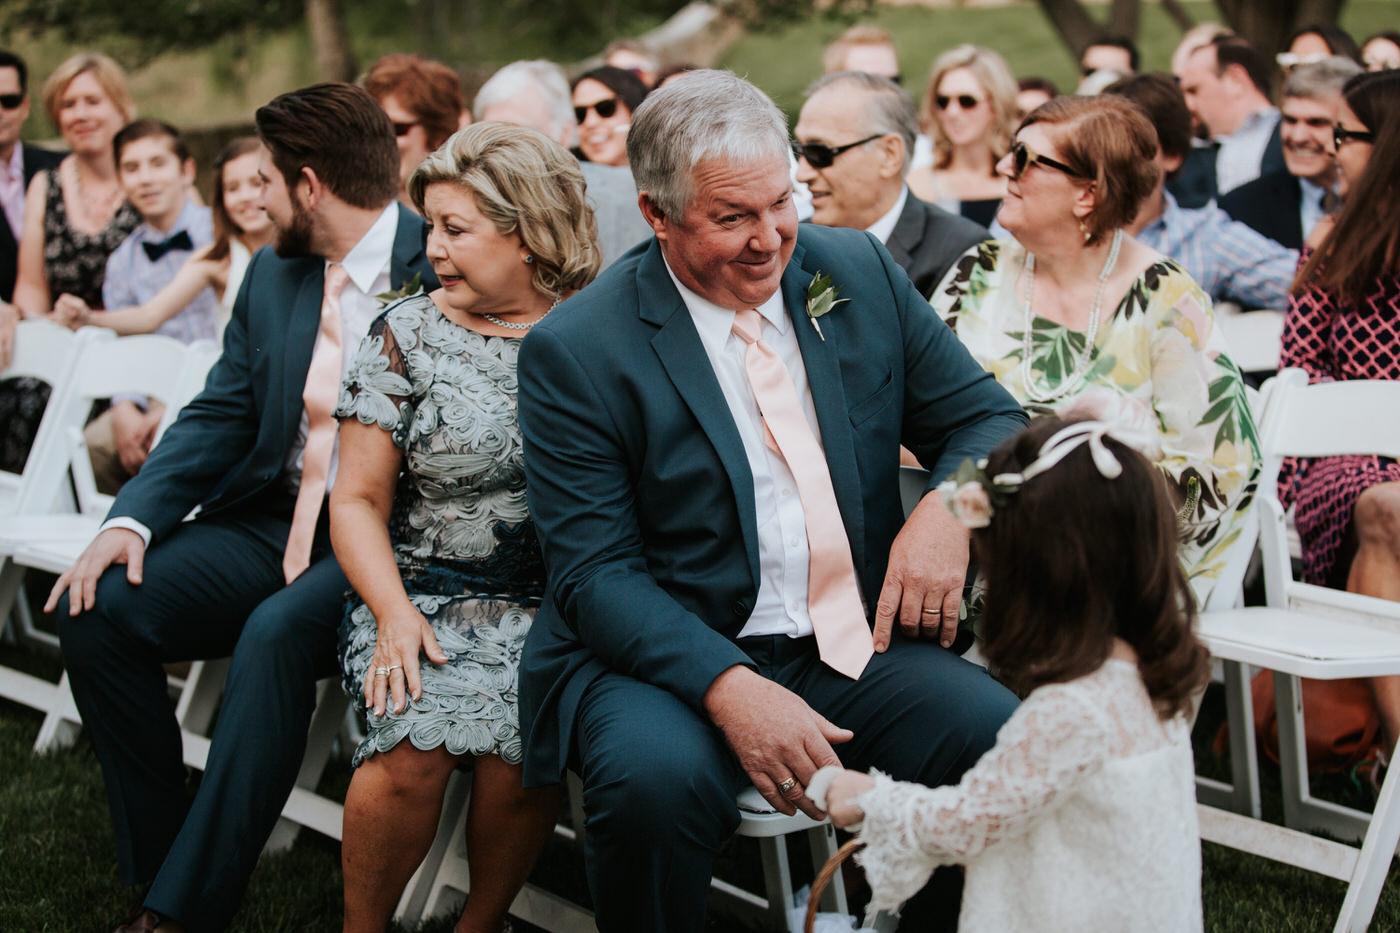 Wedding guests at Thurman's Mansion